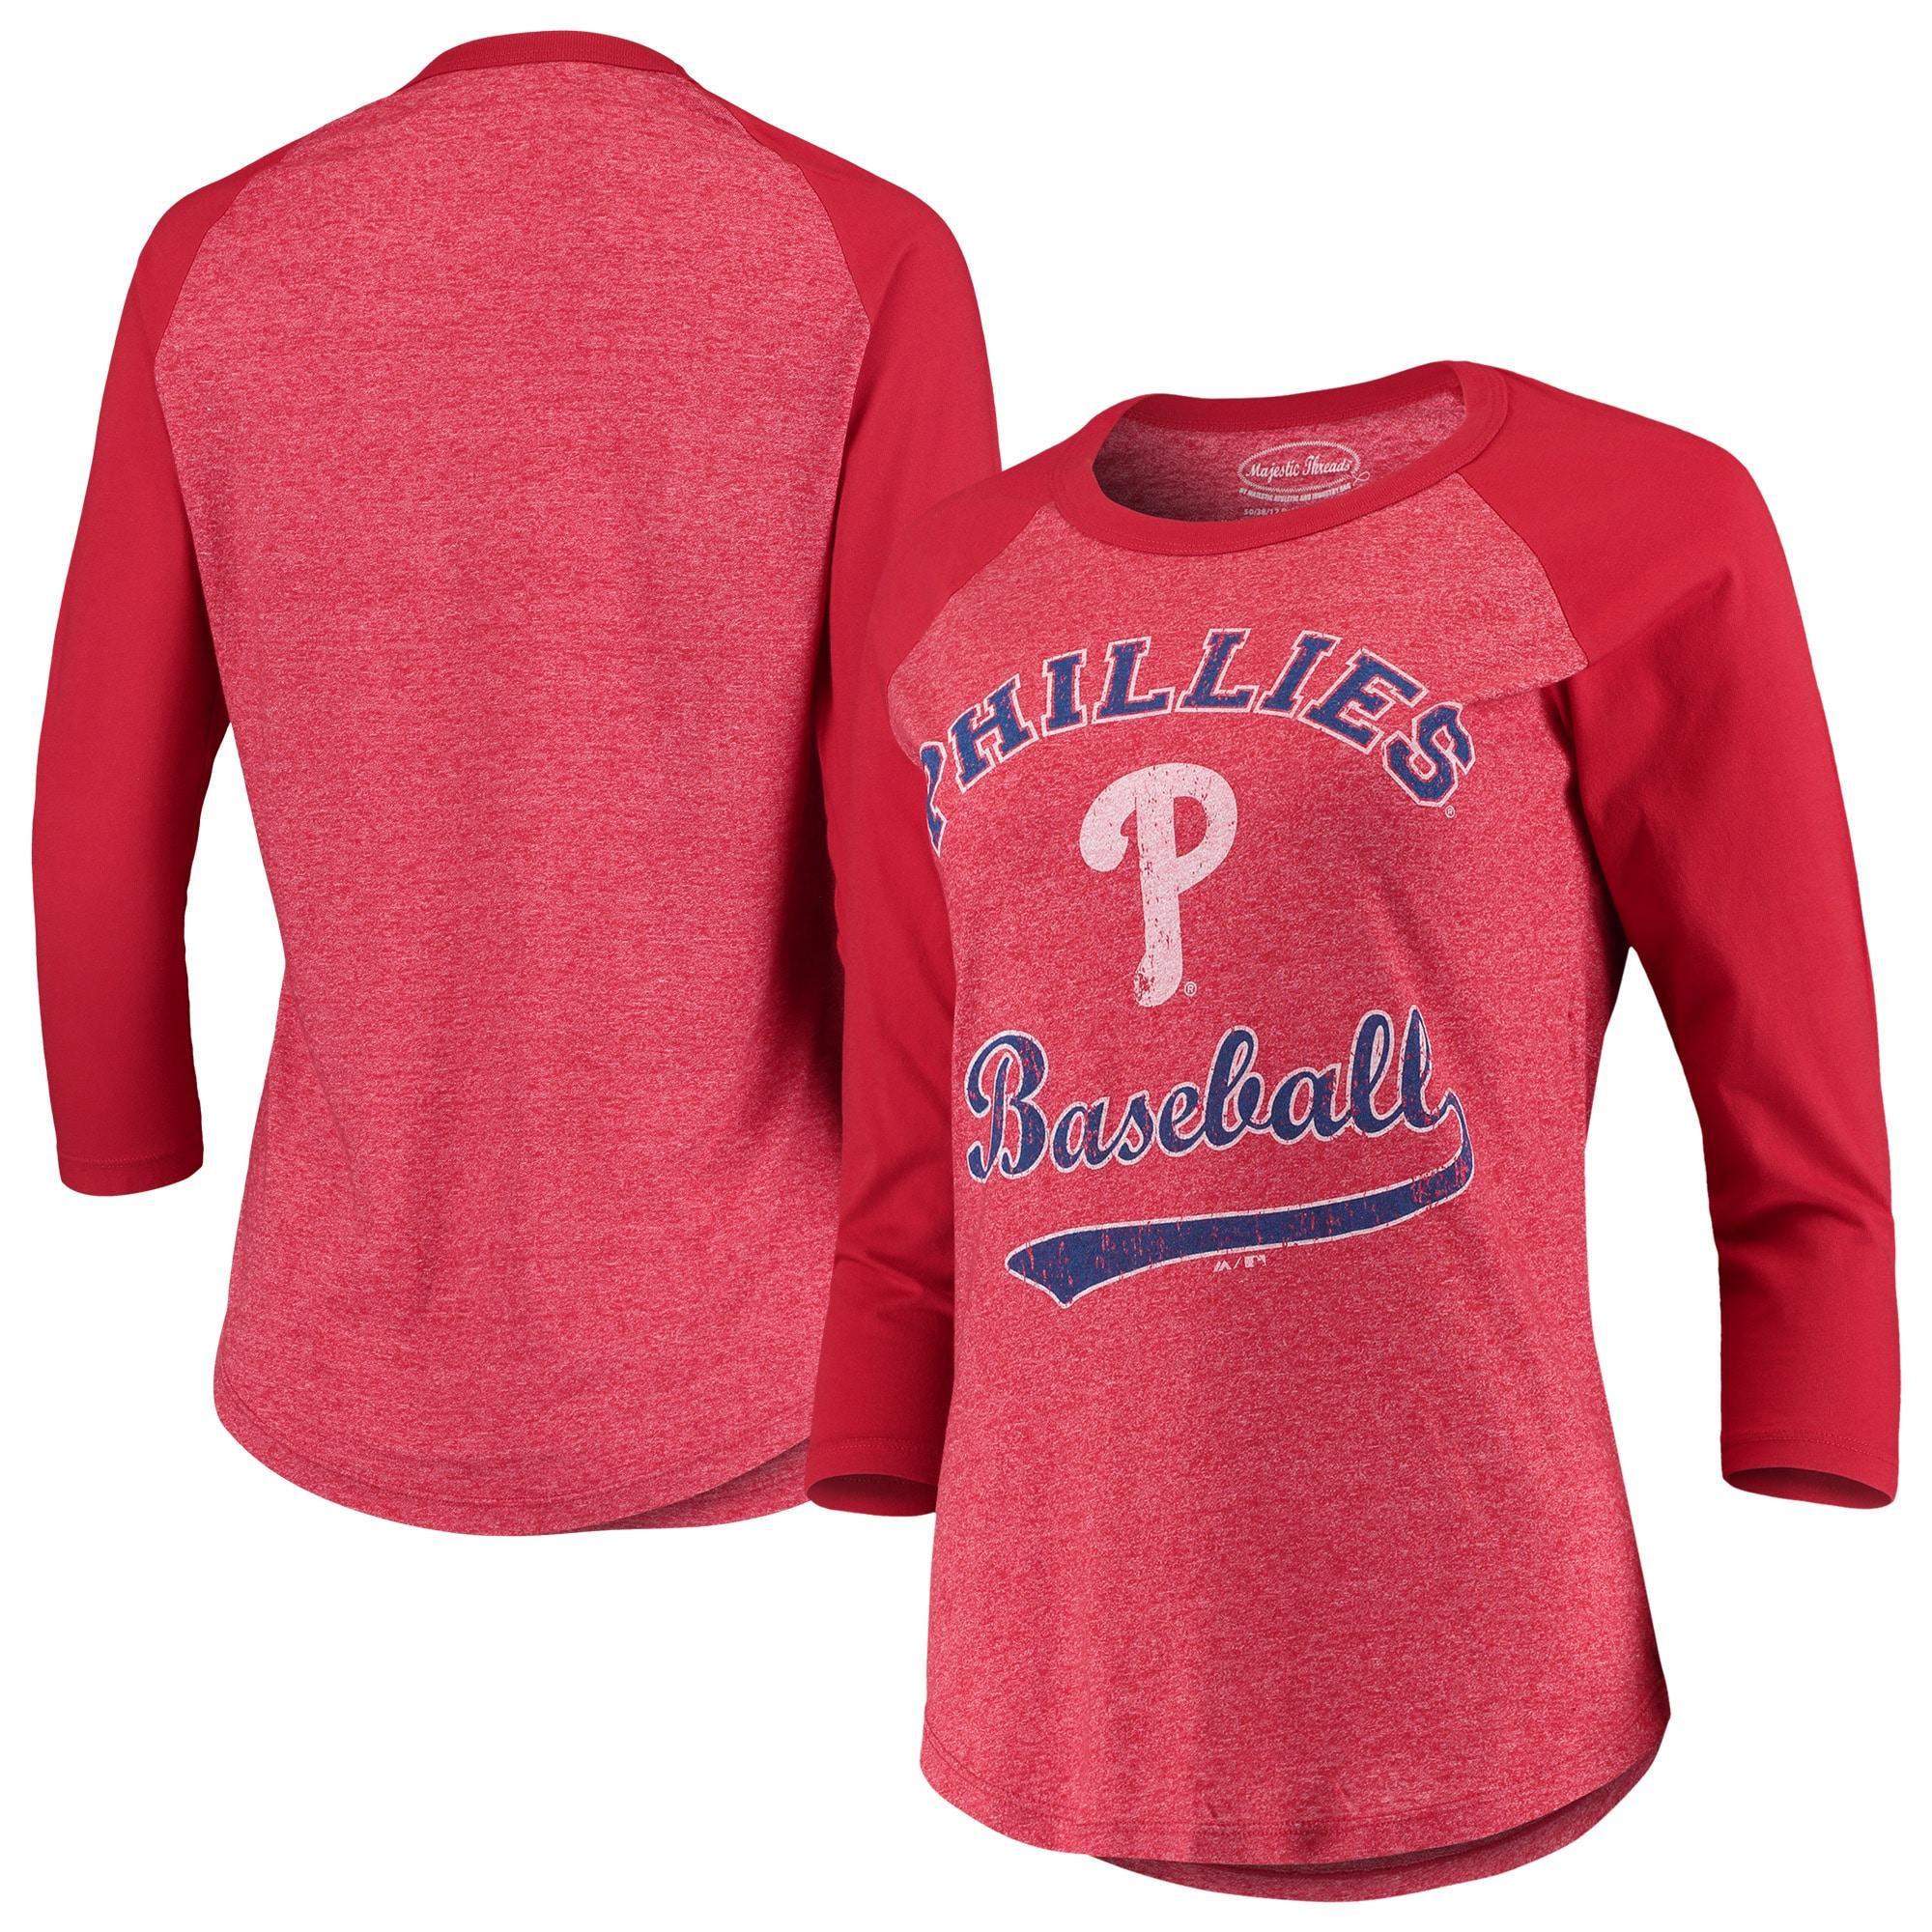 Philadelphia Phillies Majestic Threads Women's Team Baseball Three-Quarter Raglan Sleeve Tri-Blend T-Shirt - Red